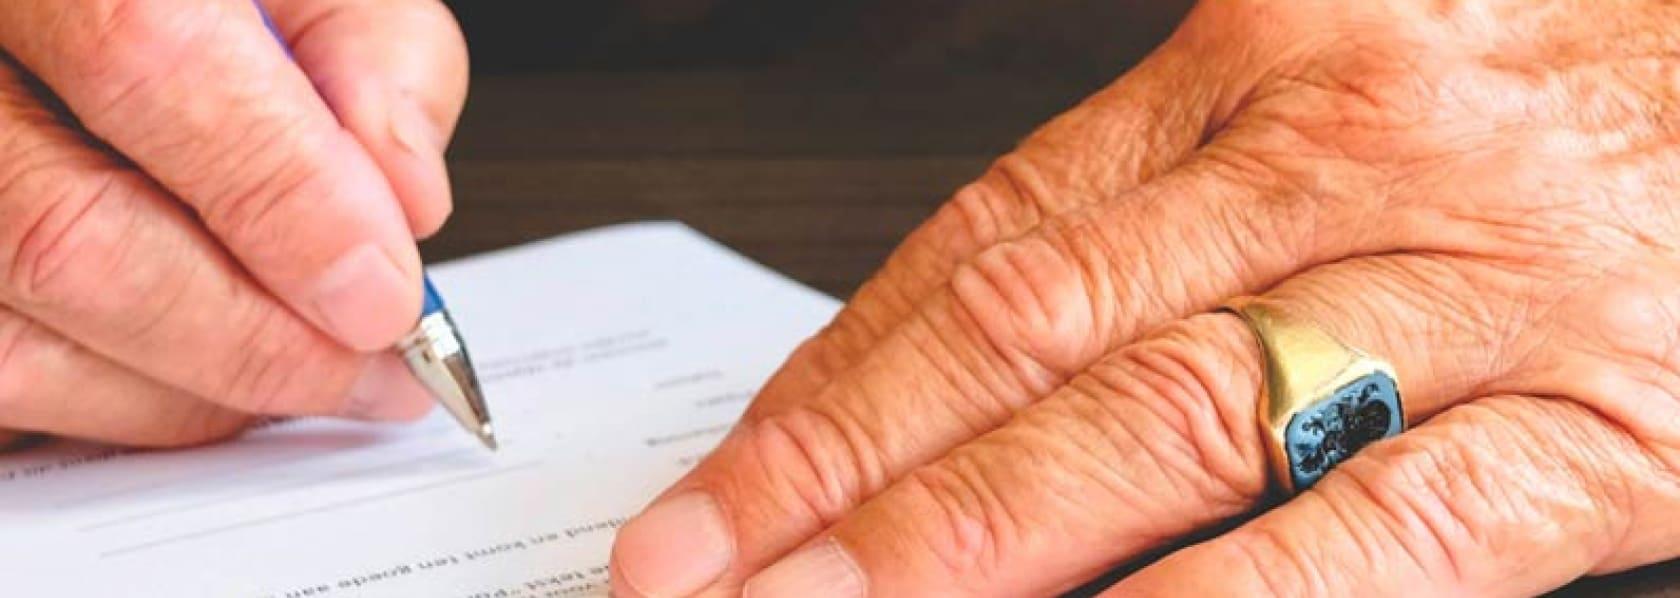 Land Registries, Escrow, Rights & Inheritance image